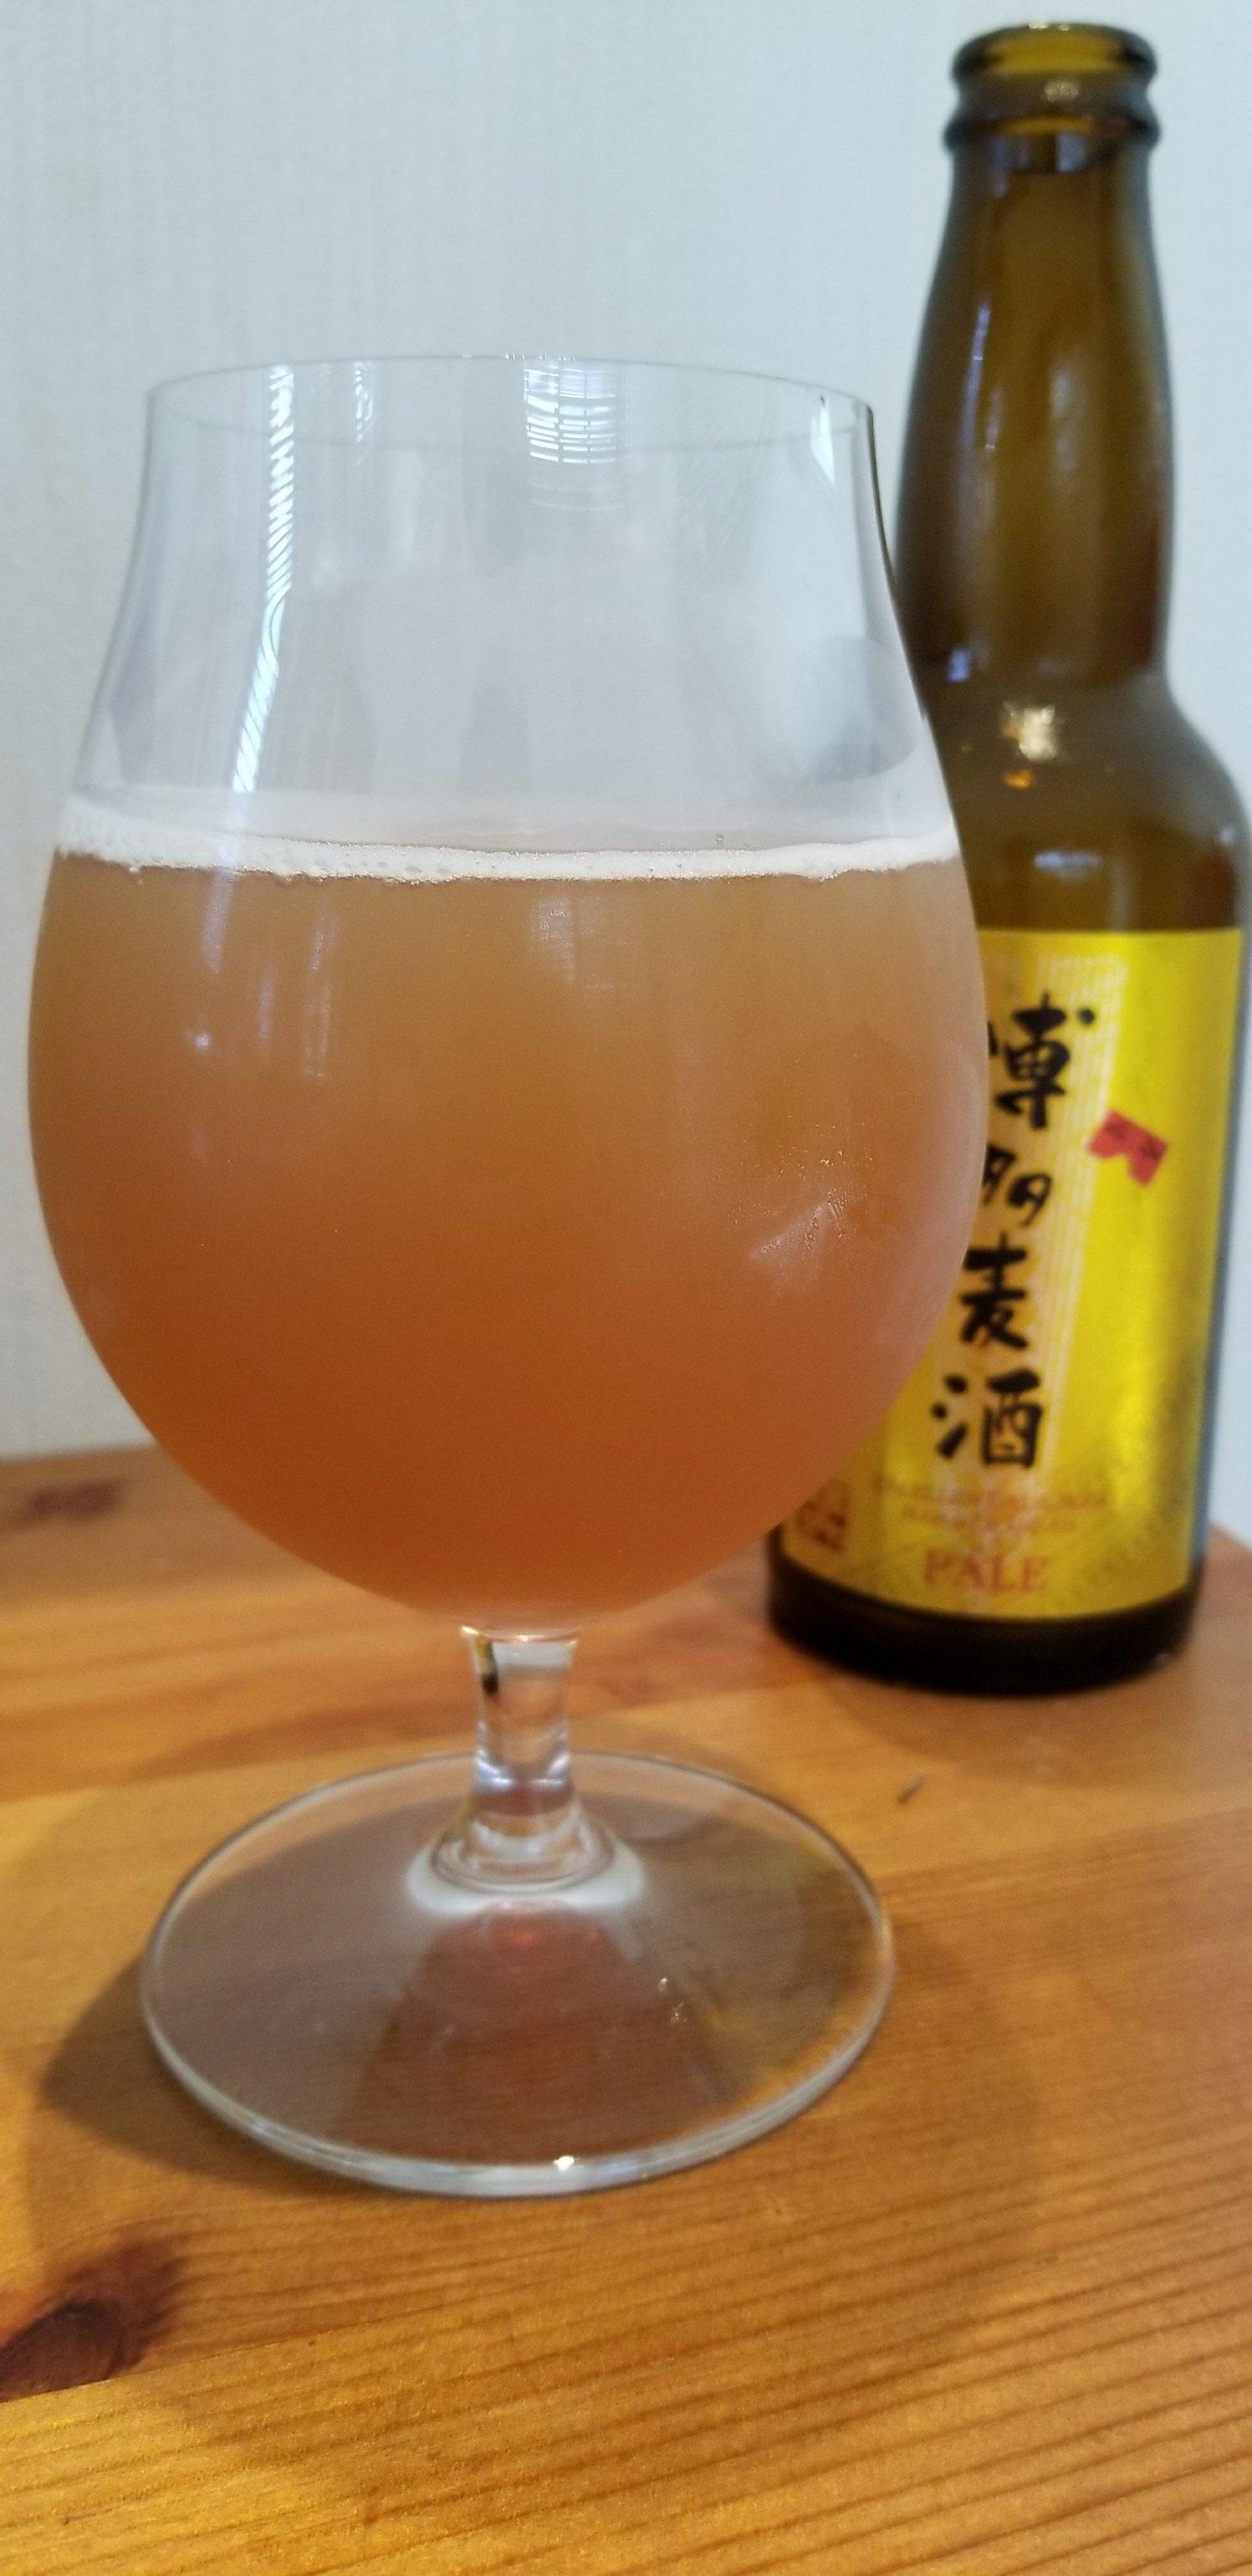 Suginoya Pale Ale